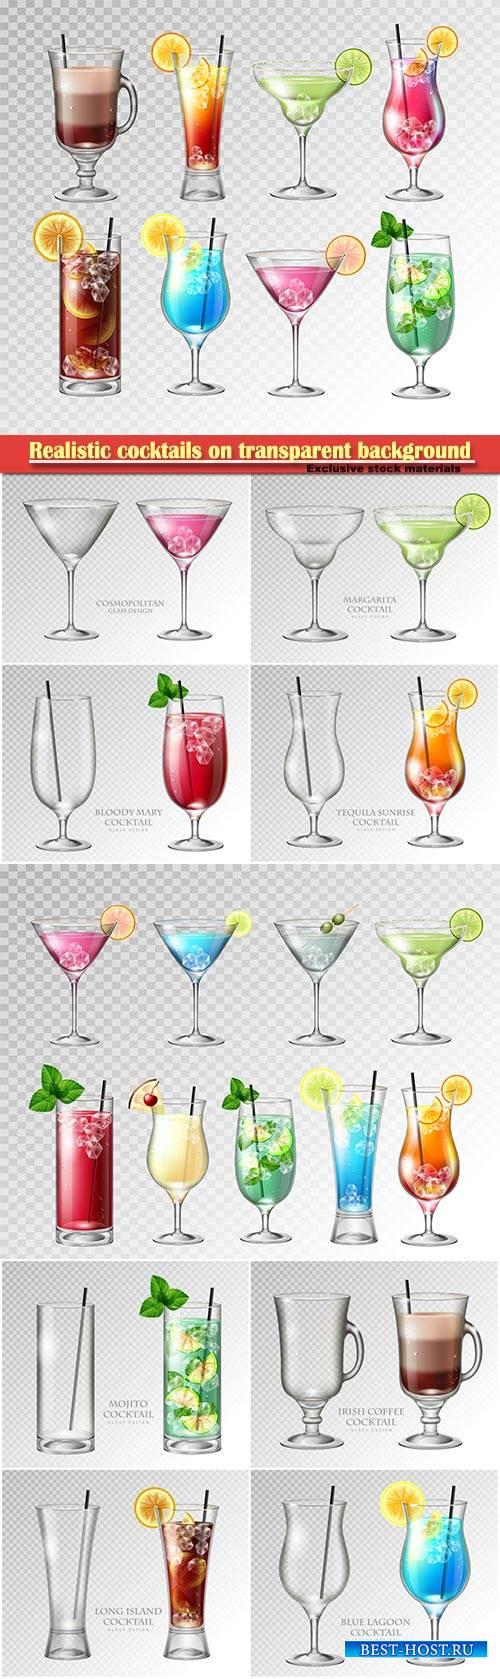 Realistic cocktails on transparent background vector illustration